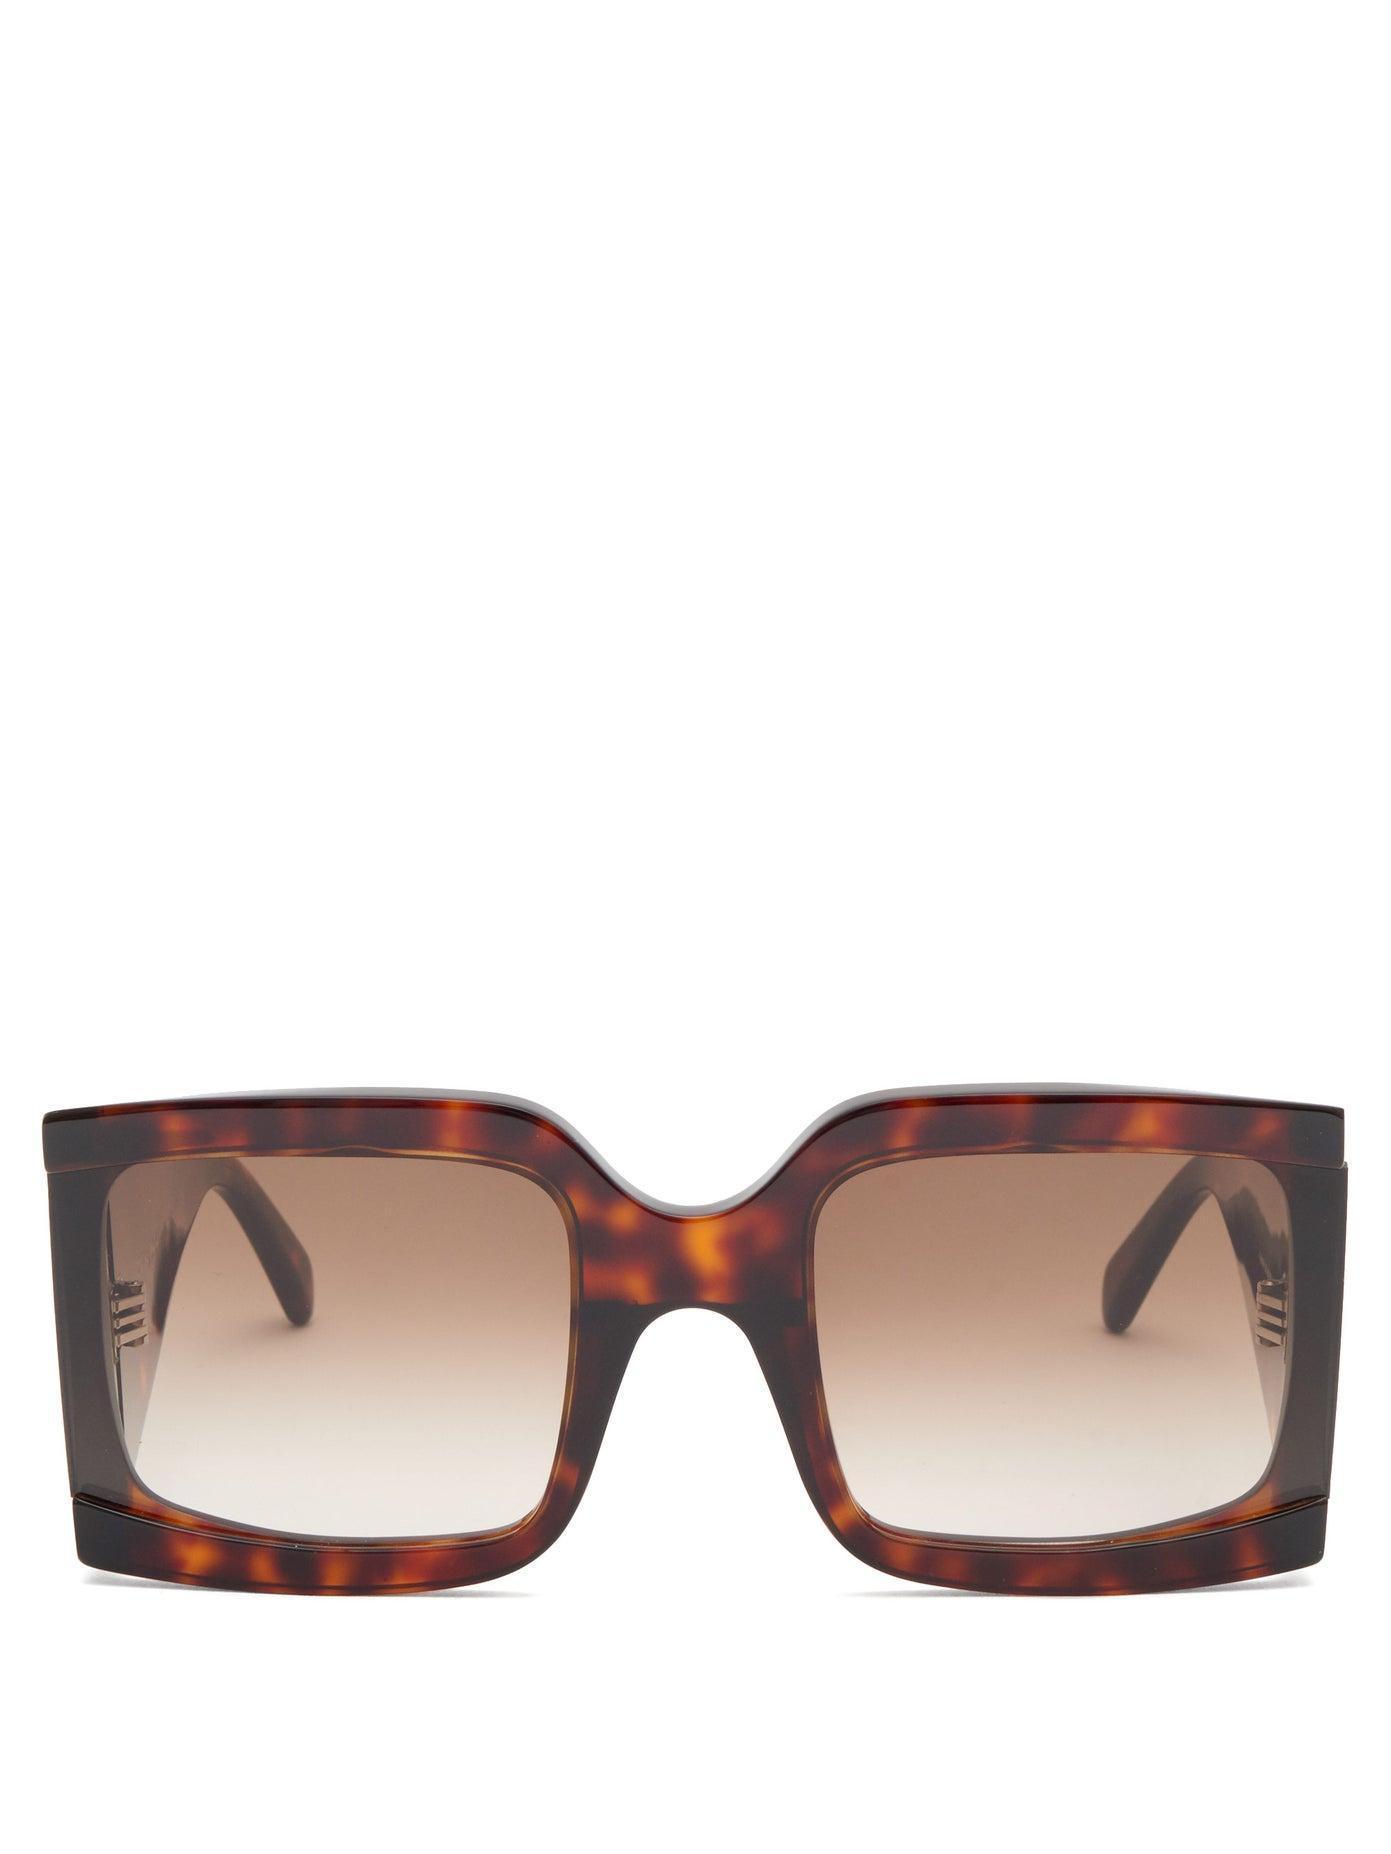 Celine — Oversized Squared Tortoiseshell Sunglasses